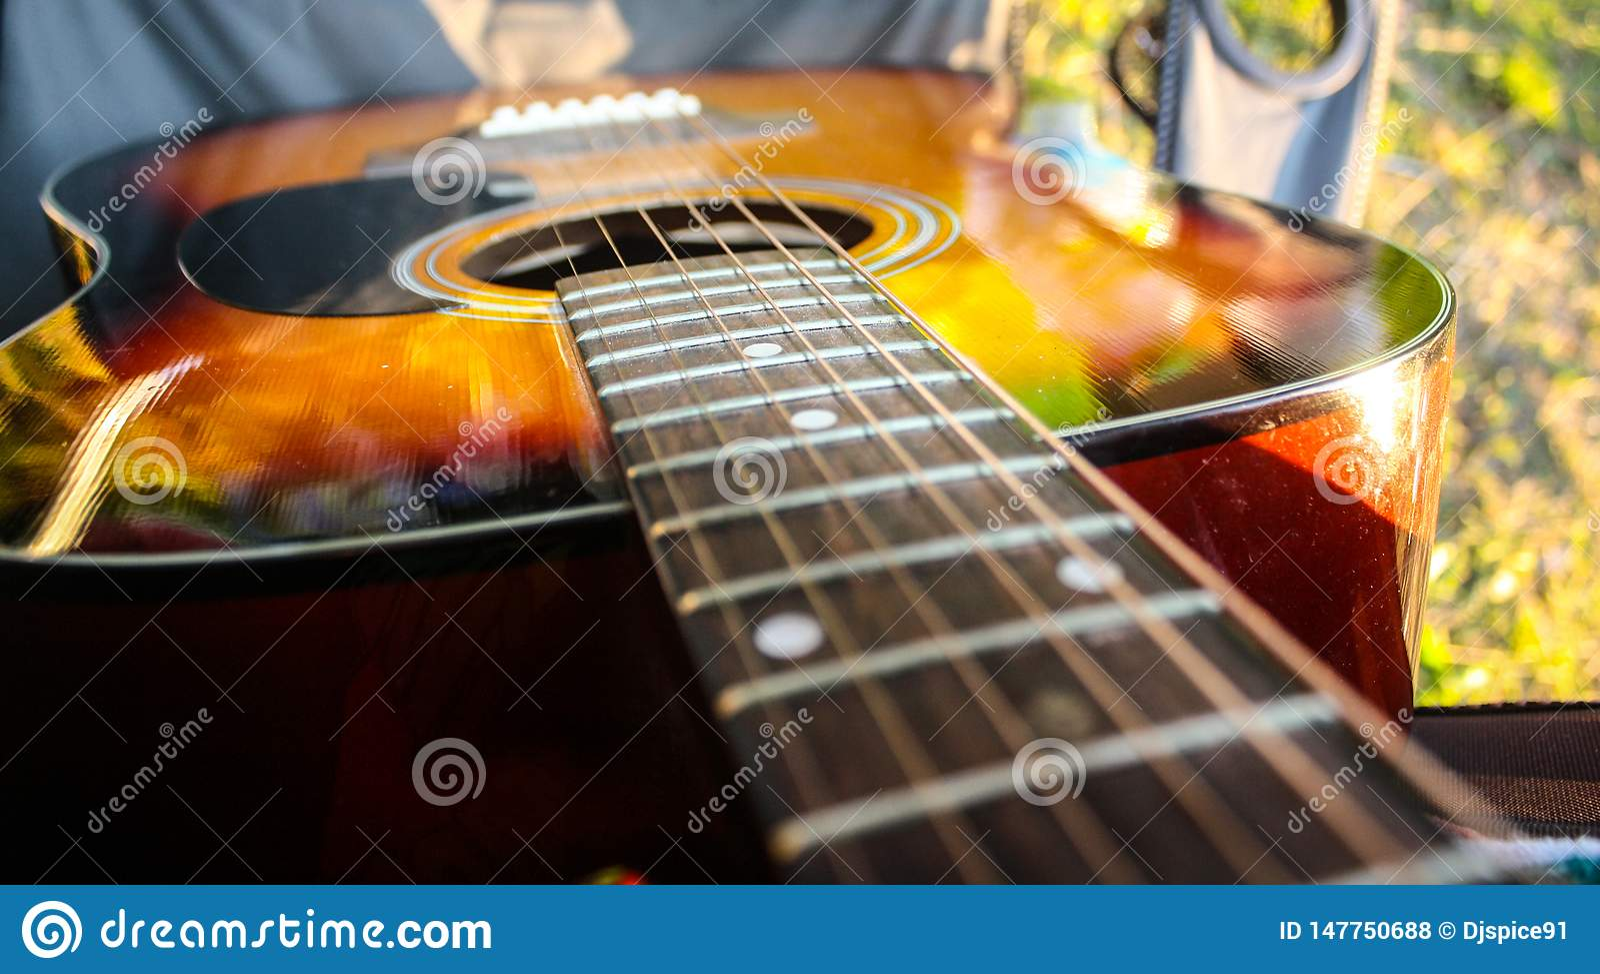 Acoustic orange guitar on camping